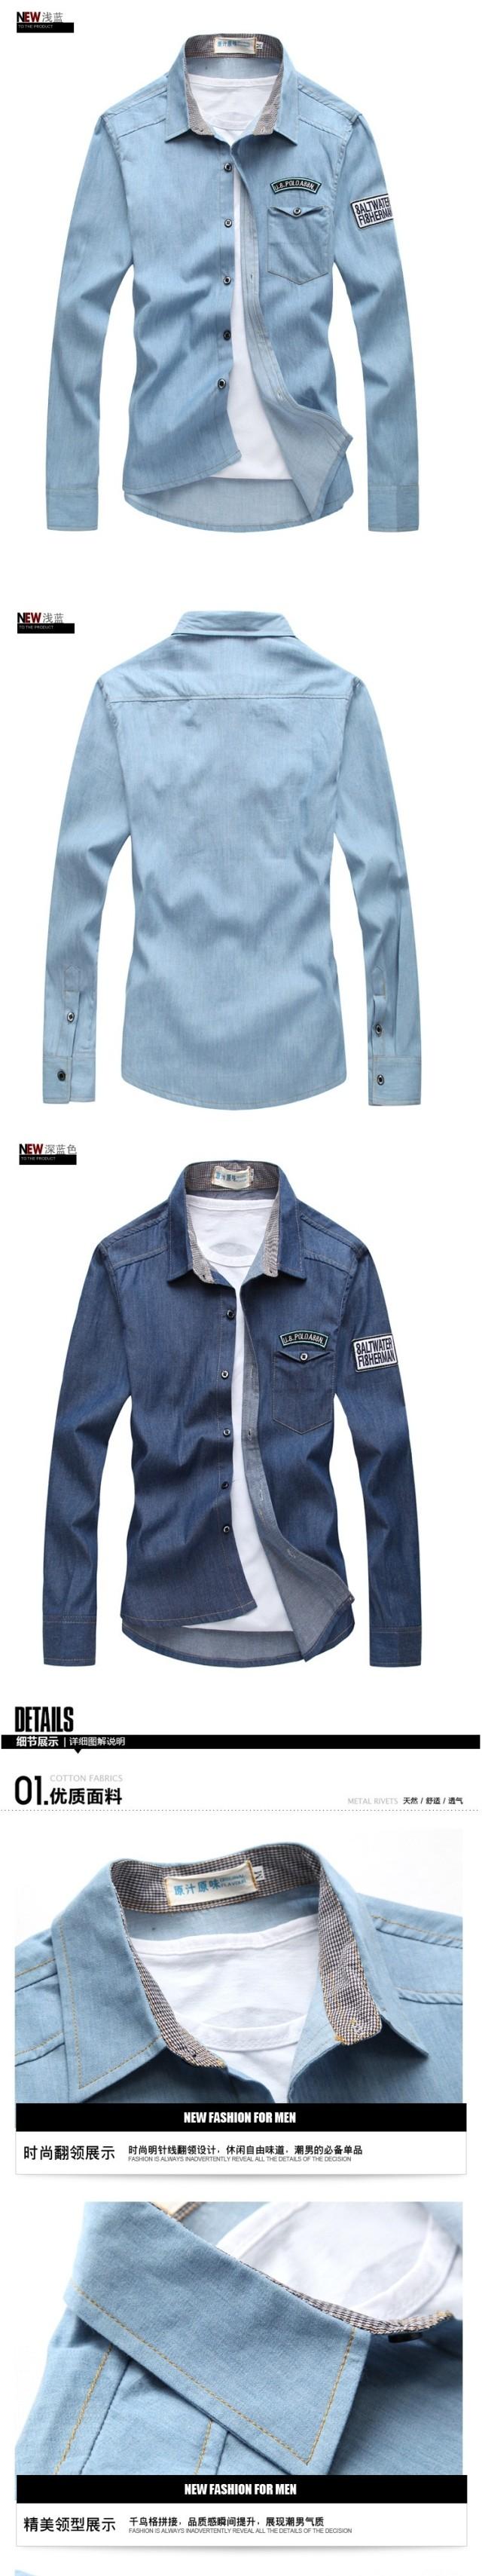 Brand Men Shirt Jeans Shirt Men Long Sleeve Turn-down Collar Cotton Shirt Male Slim Fit Camisa Masculina Casual Men Shirts Model 10